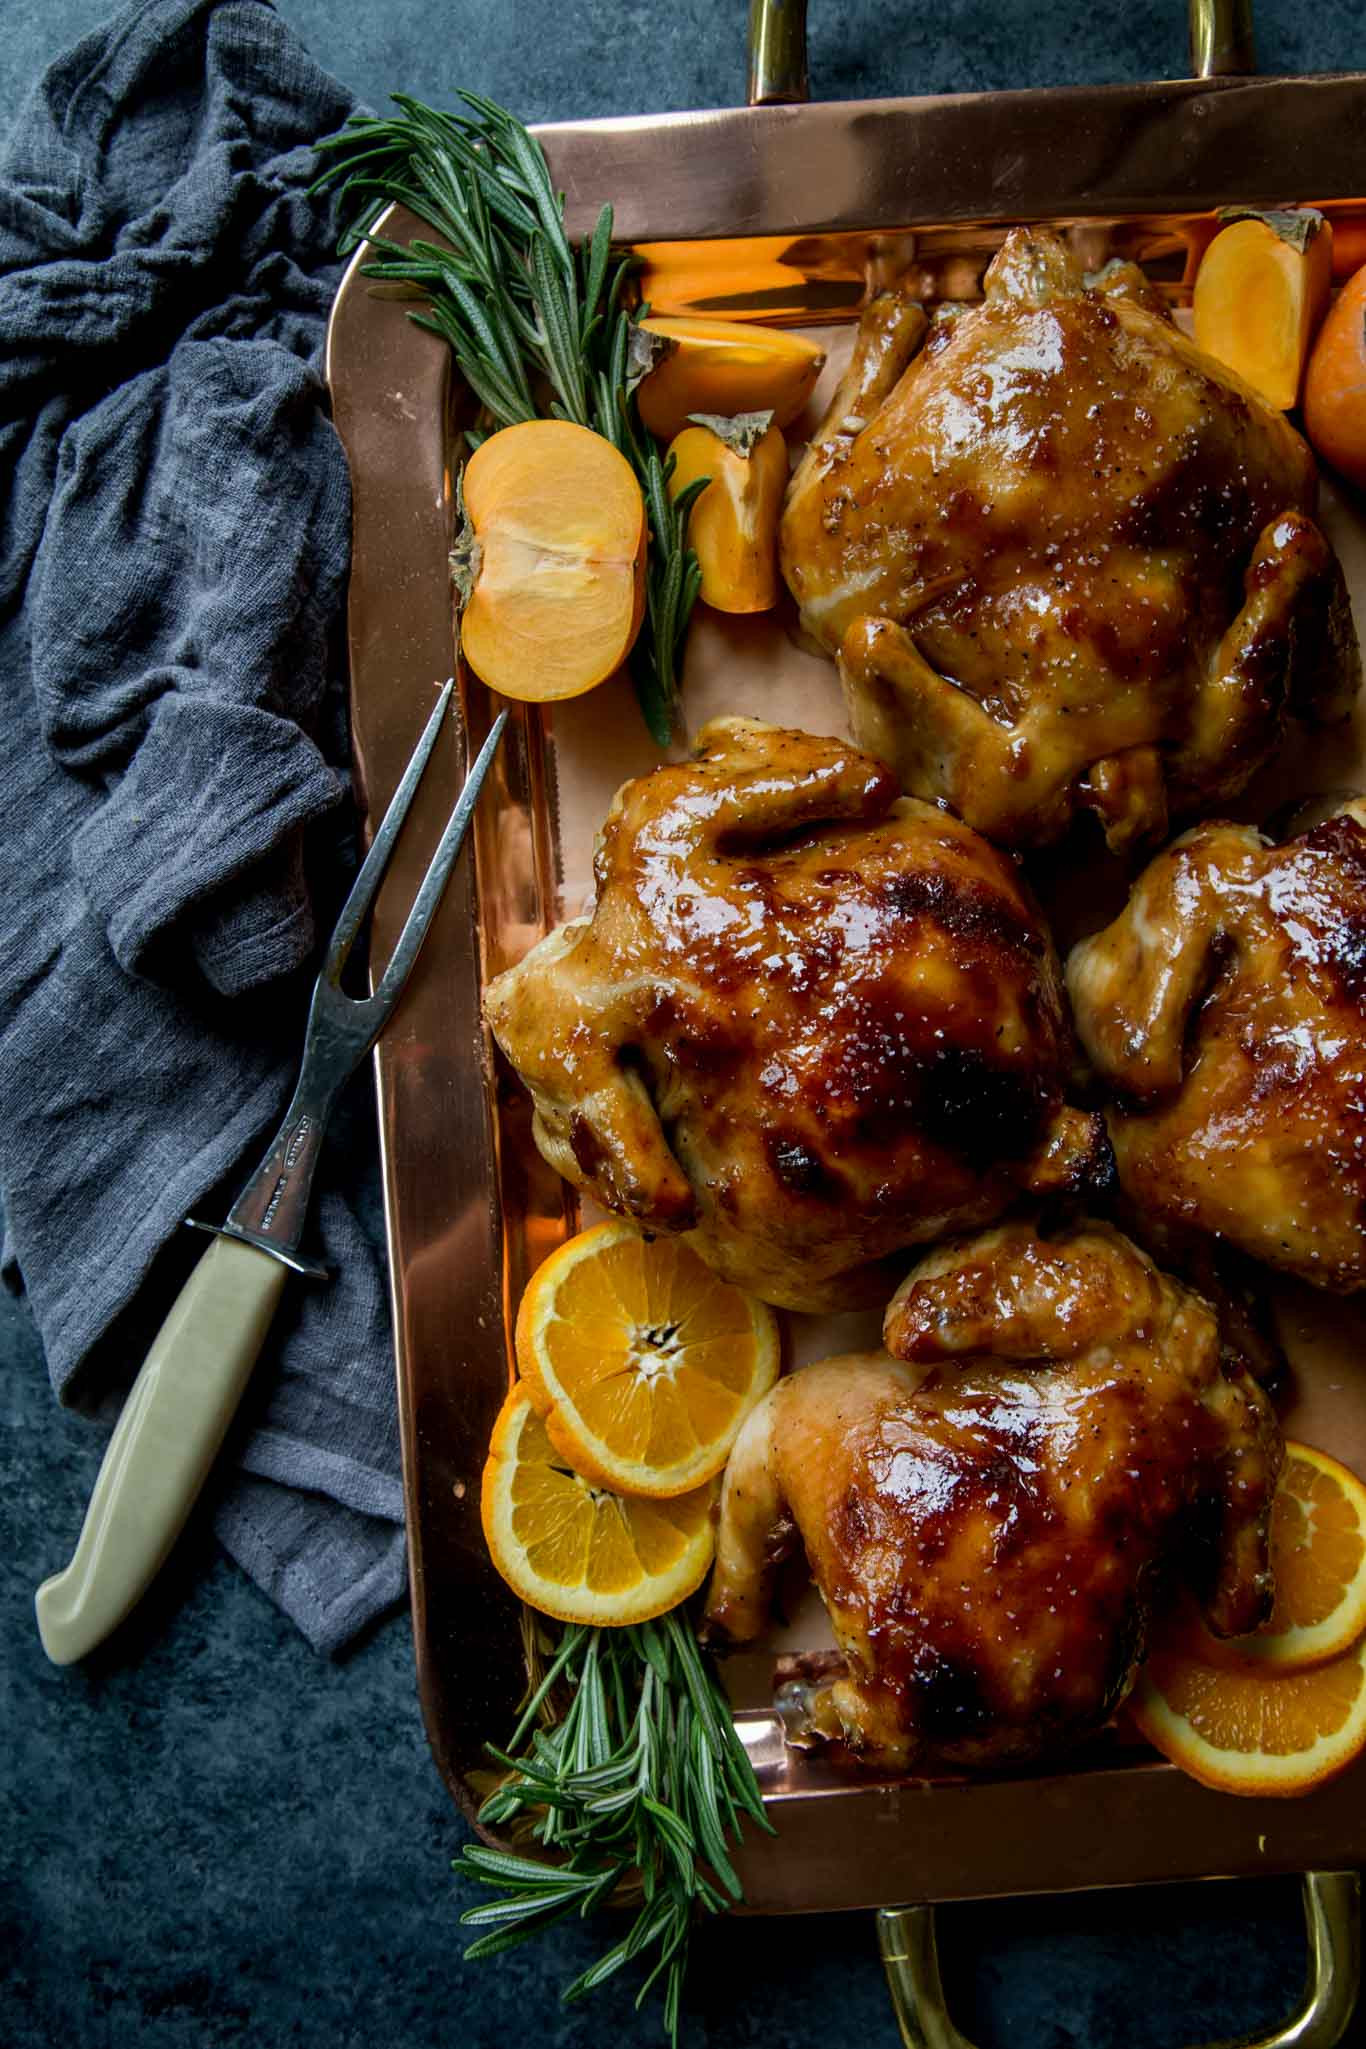 Recipes For Cornish Game Hens  Cornish Game Hen Recipe with Apricot Glaze